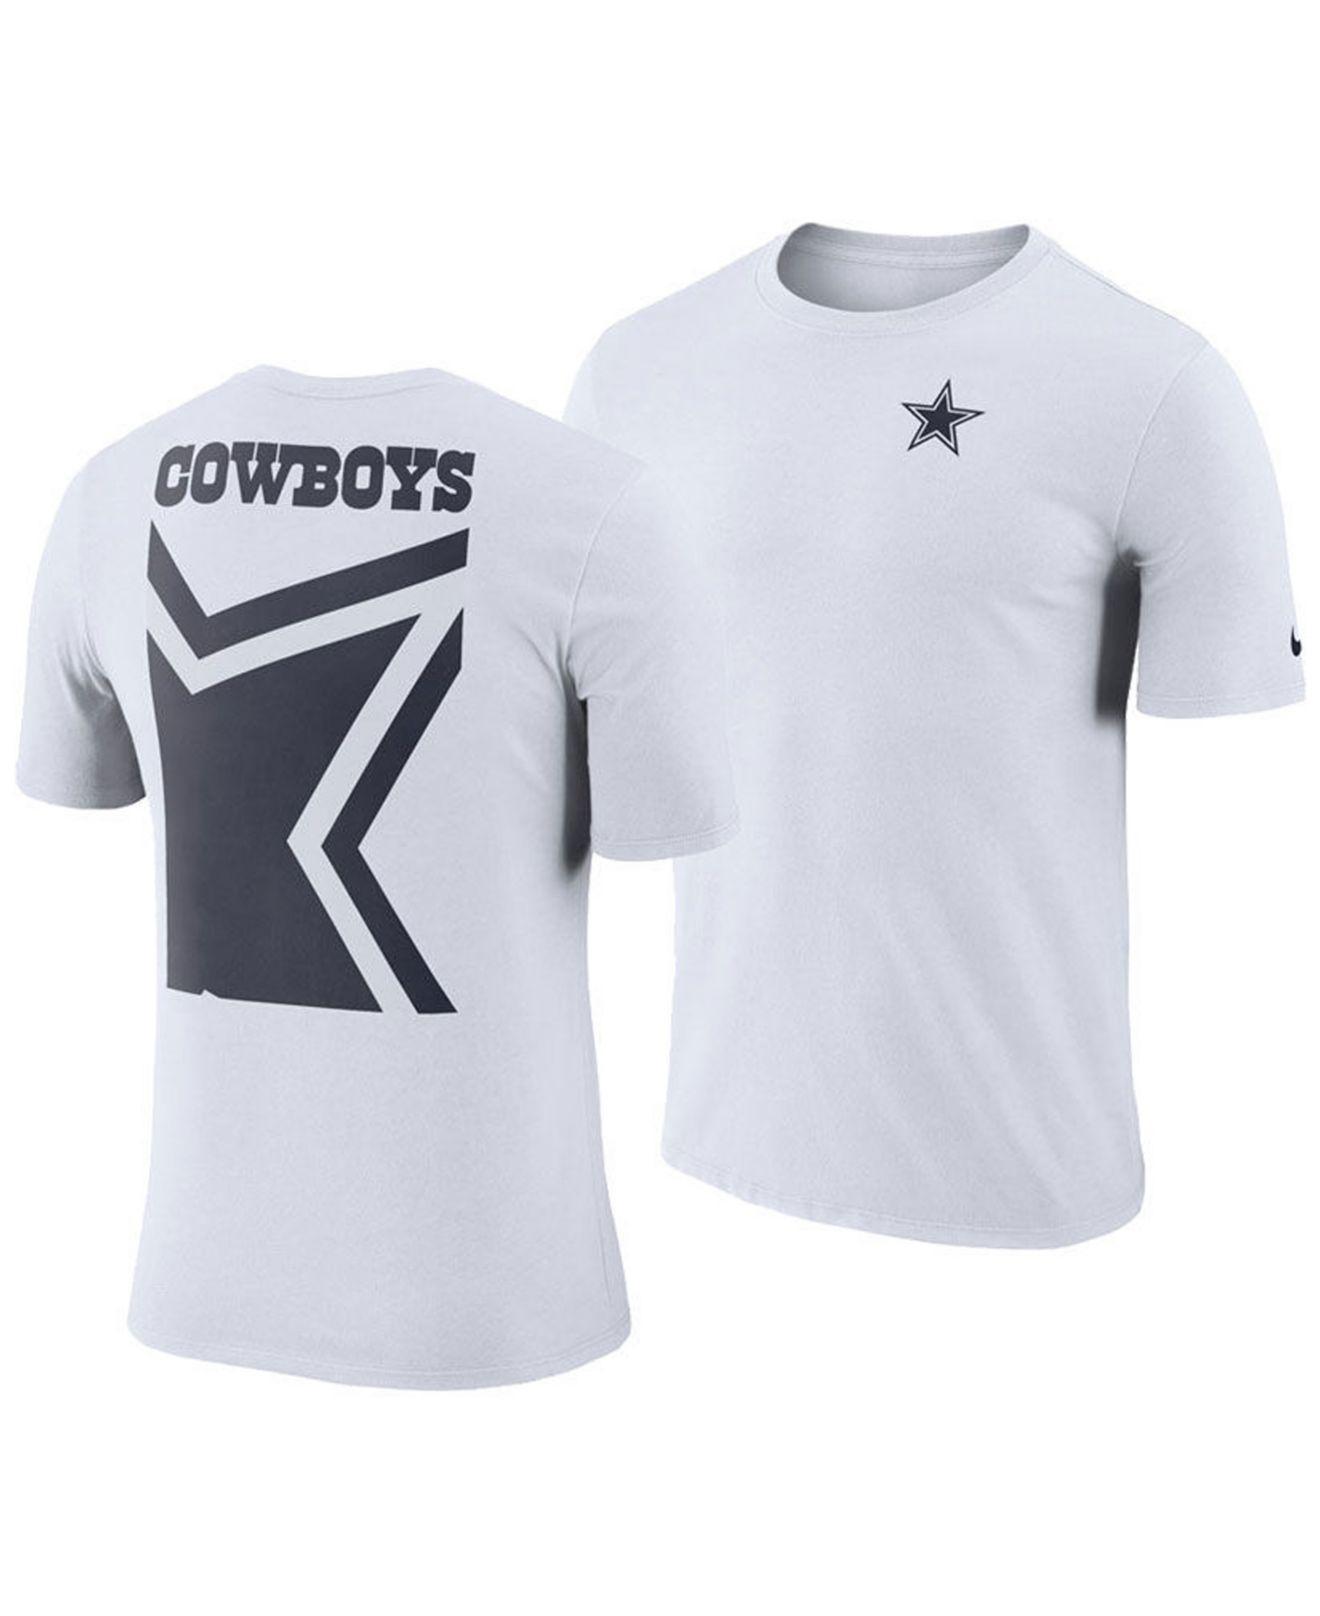 d1411a78 Nike White Dallas Cowboys Crew Champ T-shirt for men